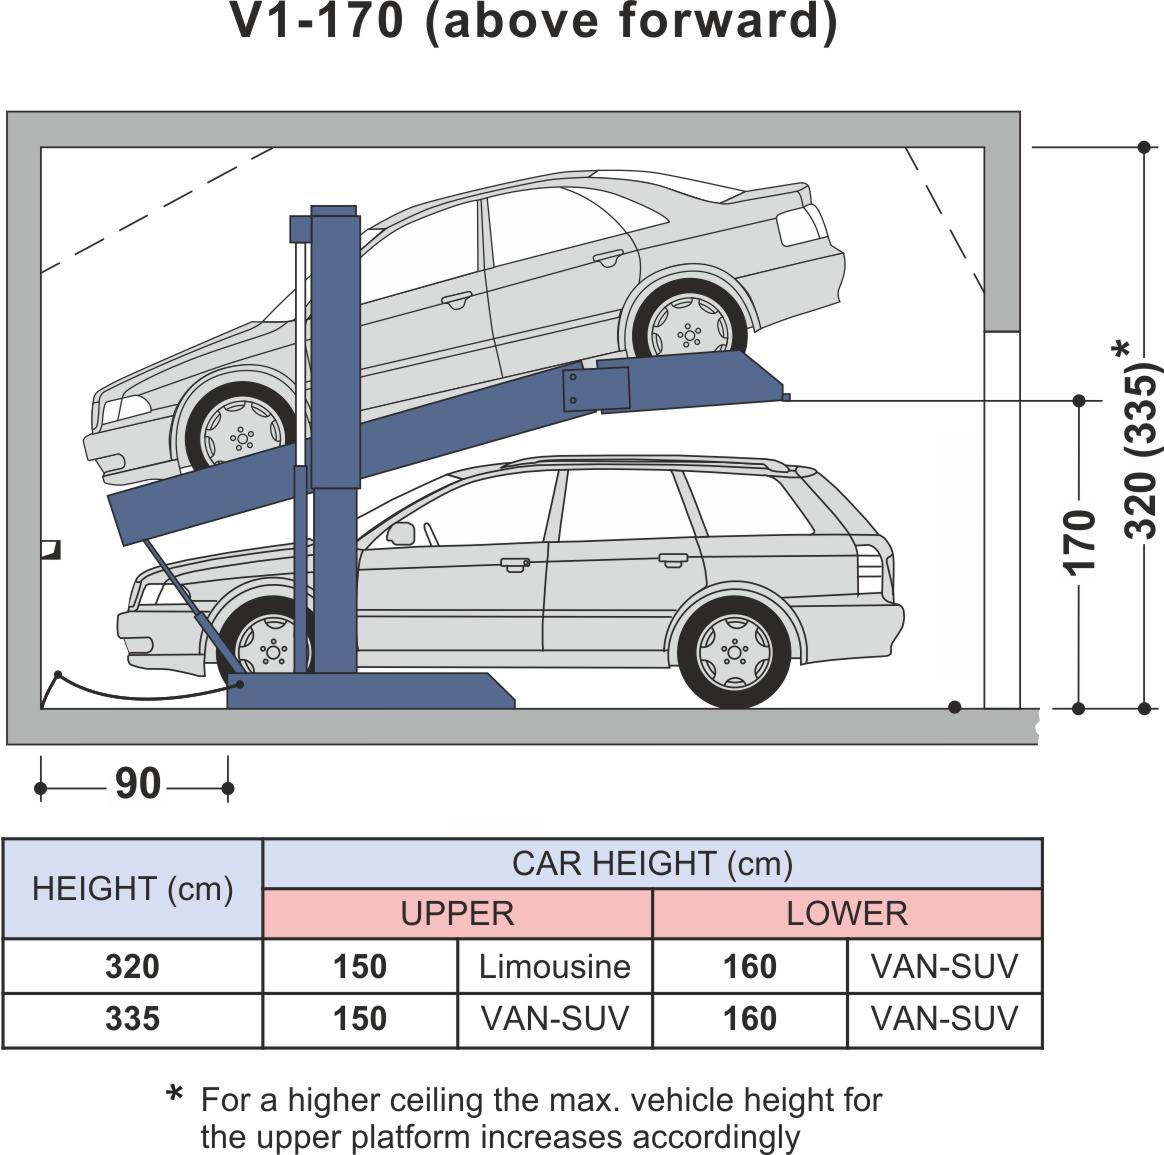 V1-forward-170-320-335